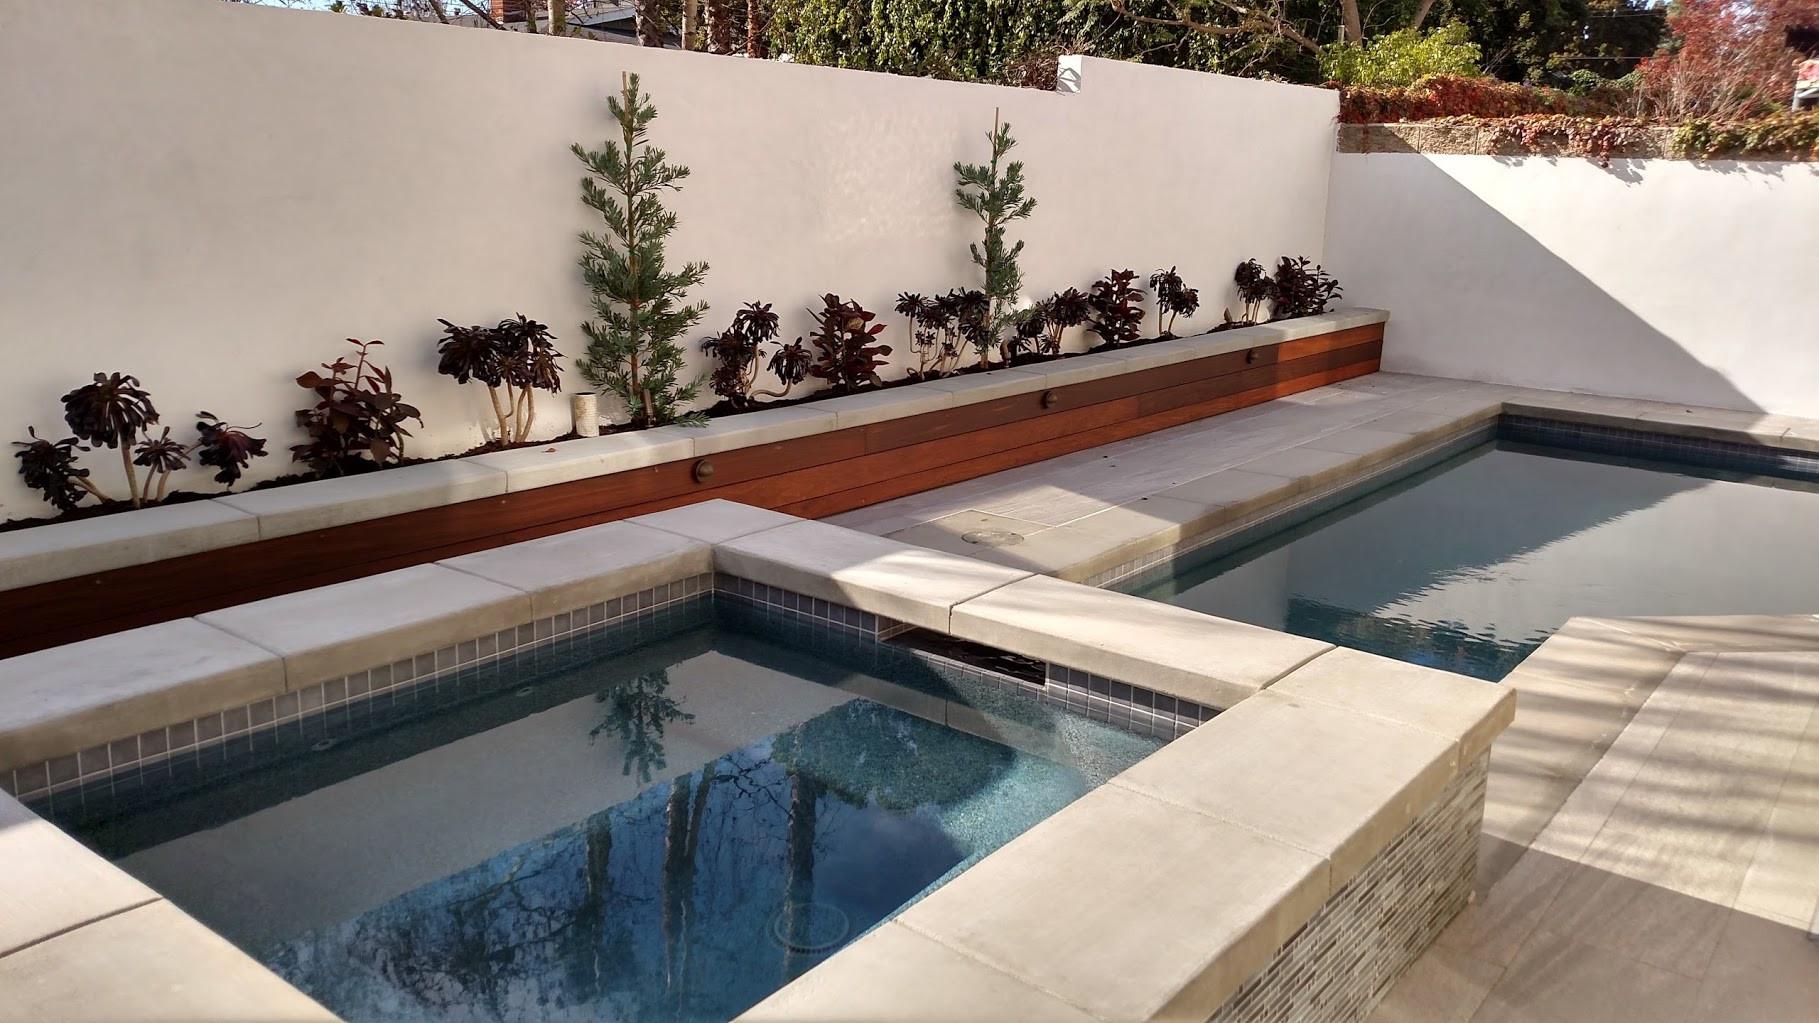 Compact pool and spa,